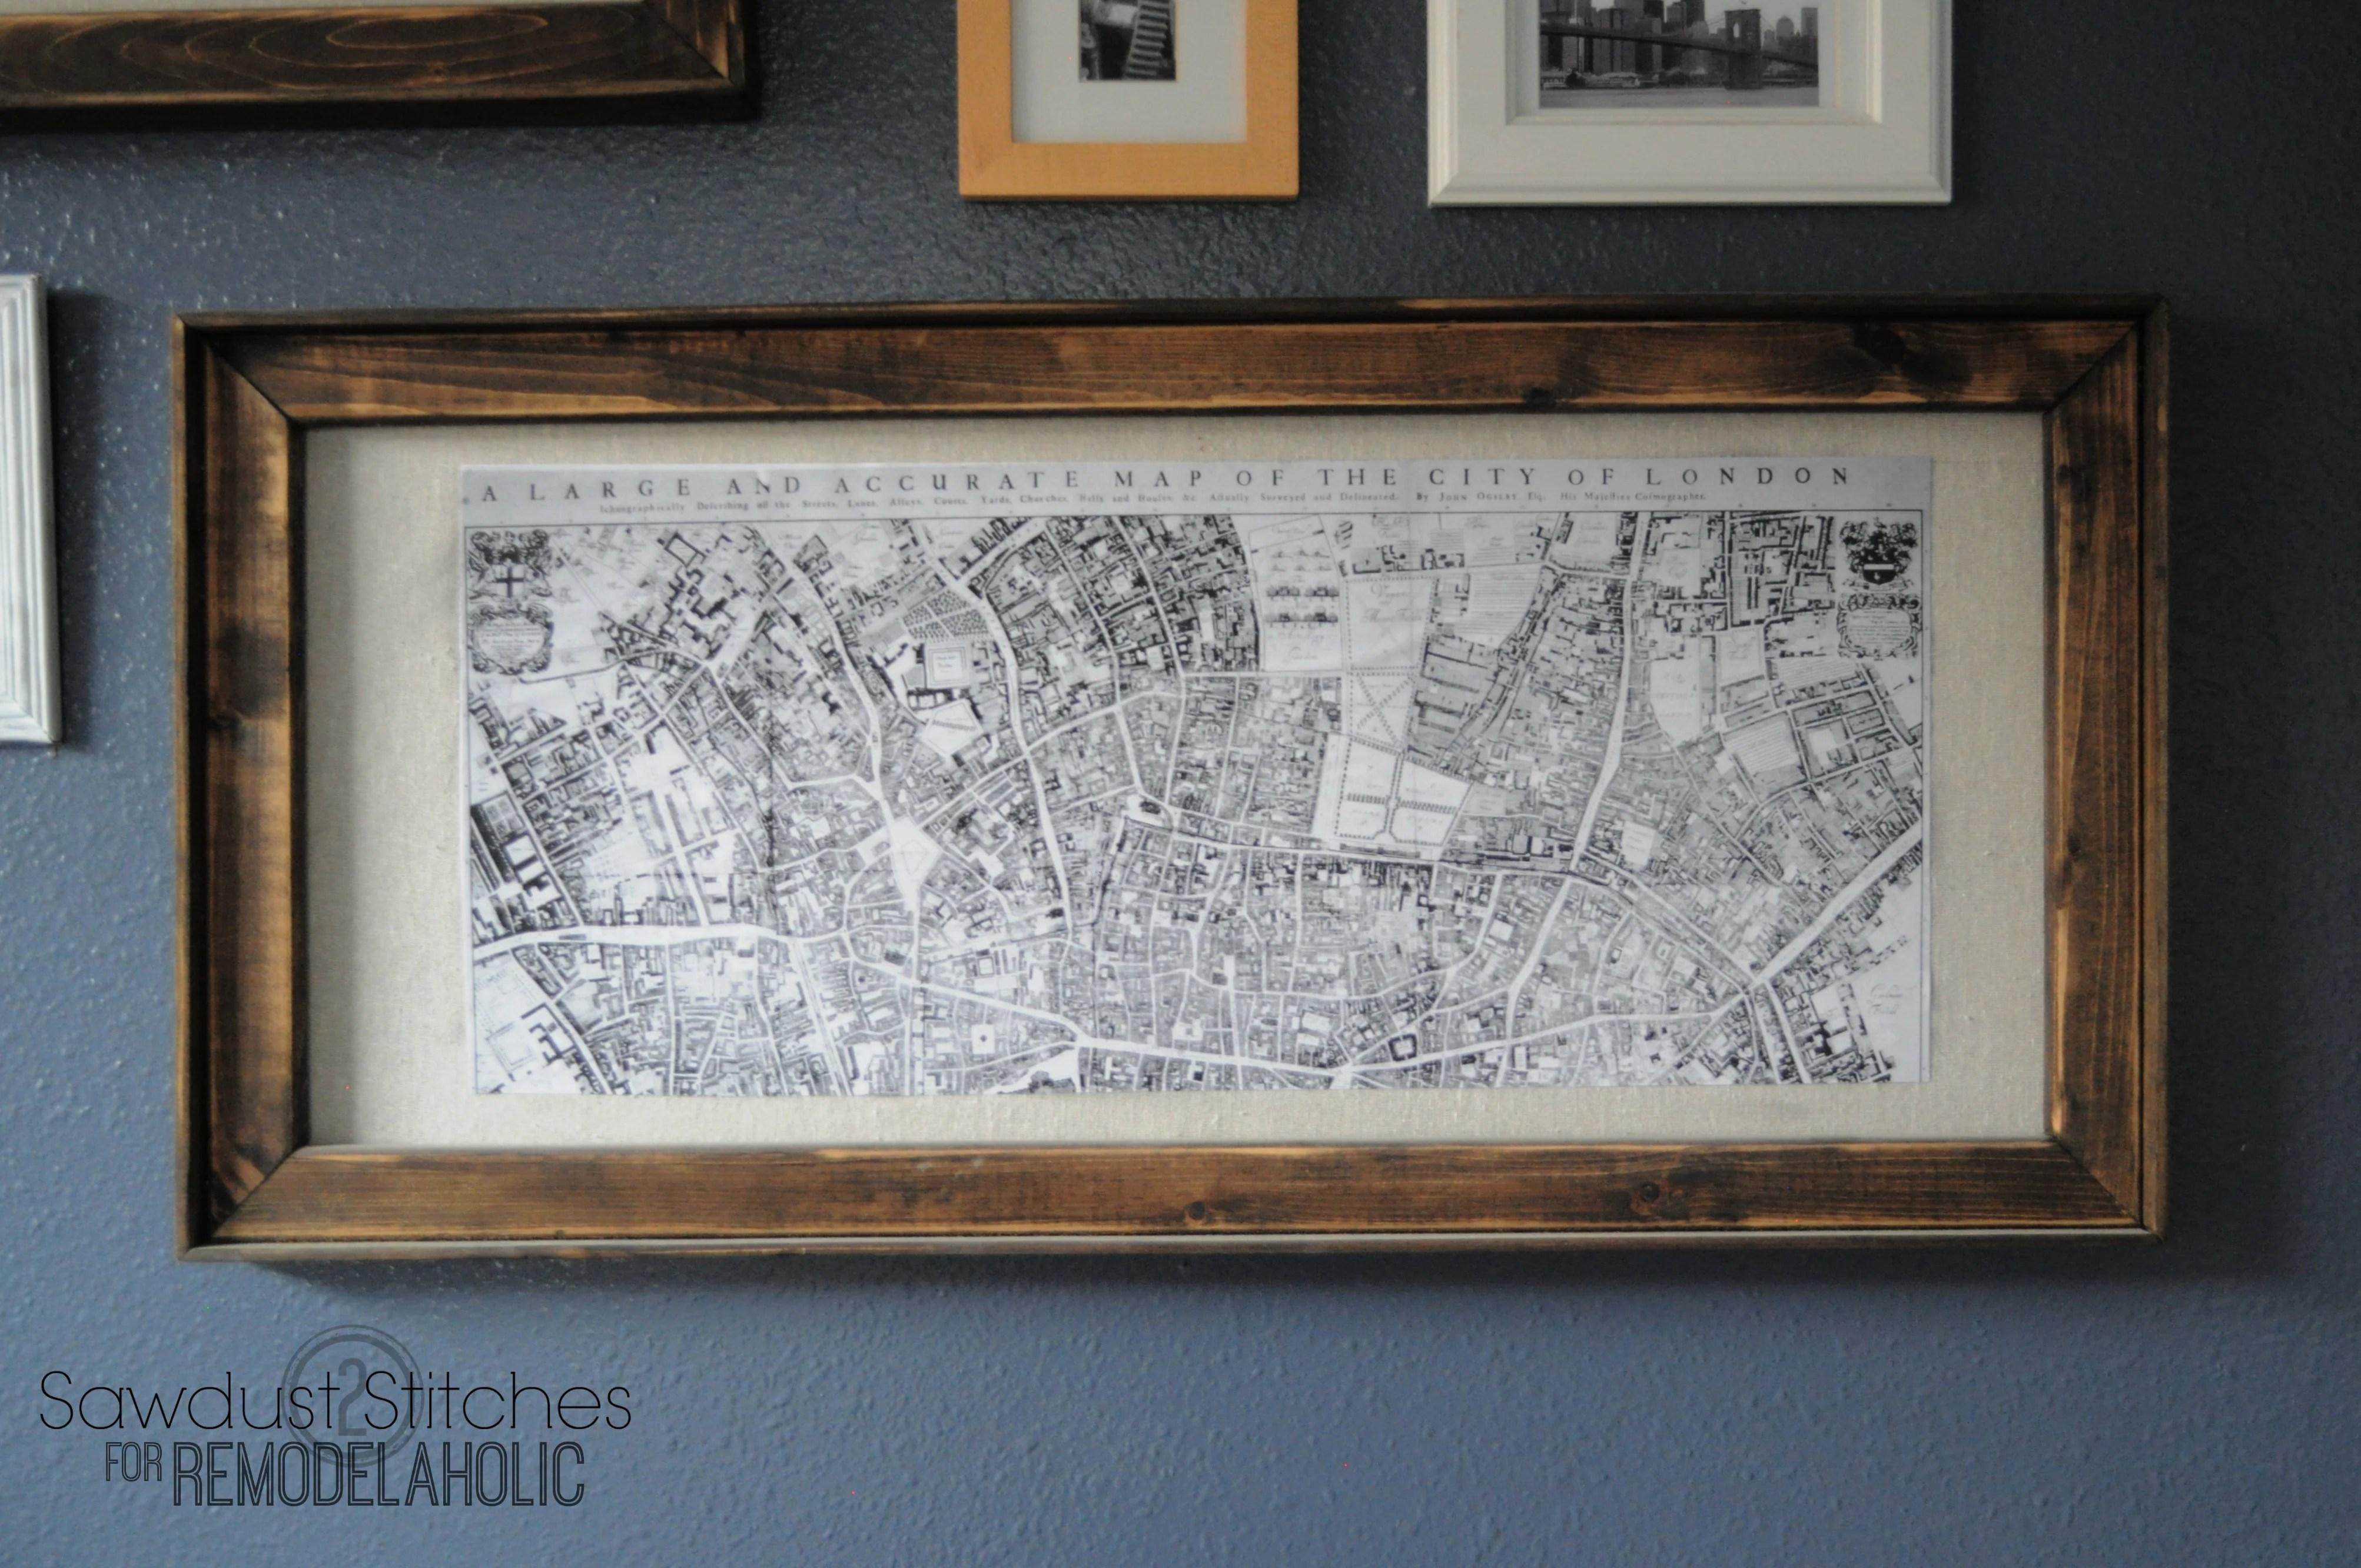 Remodelaholic | 50+ Ways to Display Art Prints and Photos